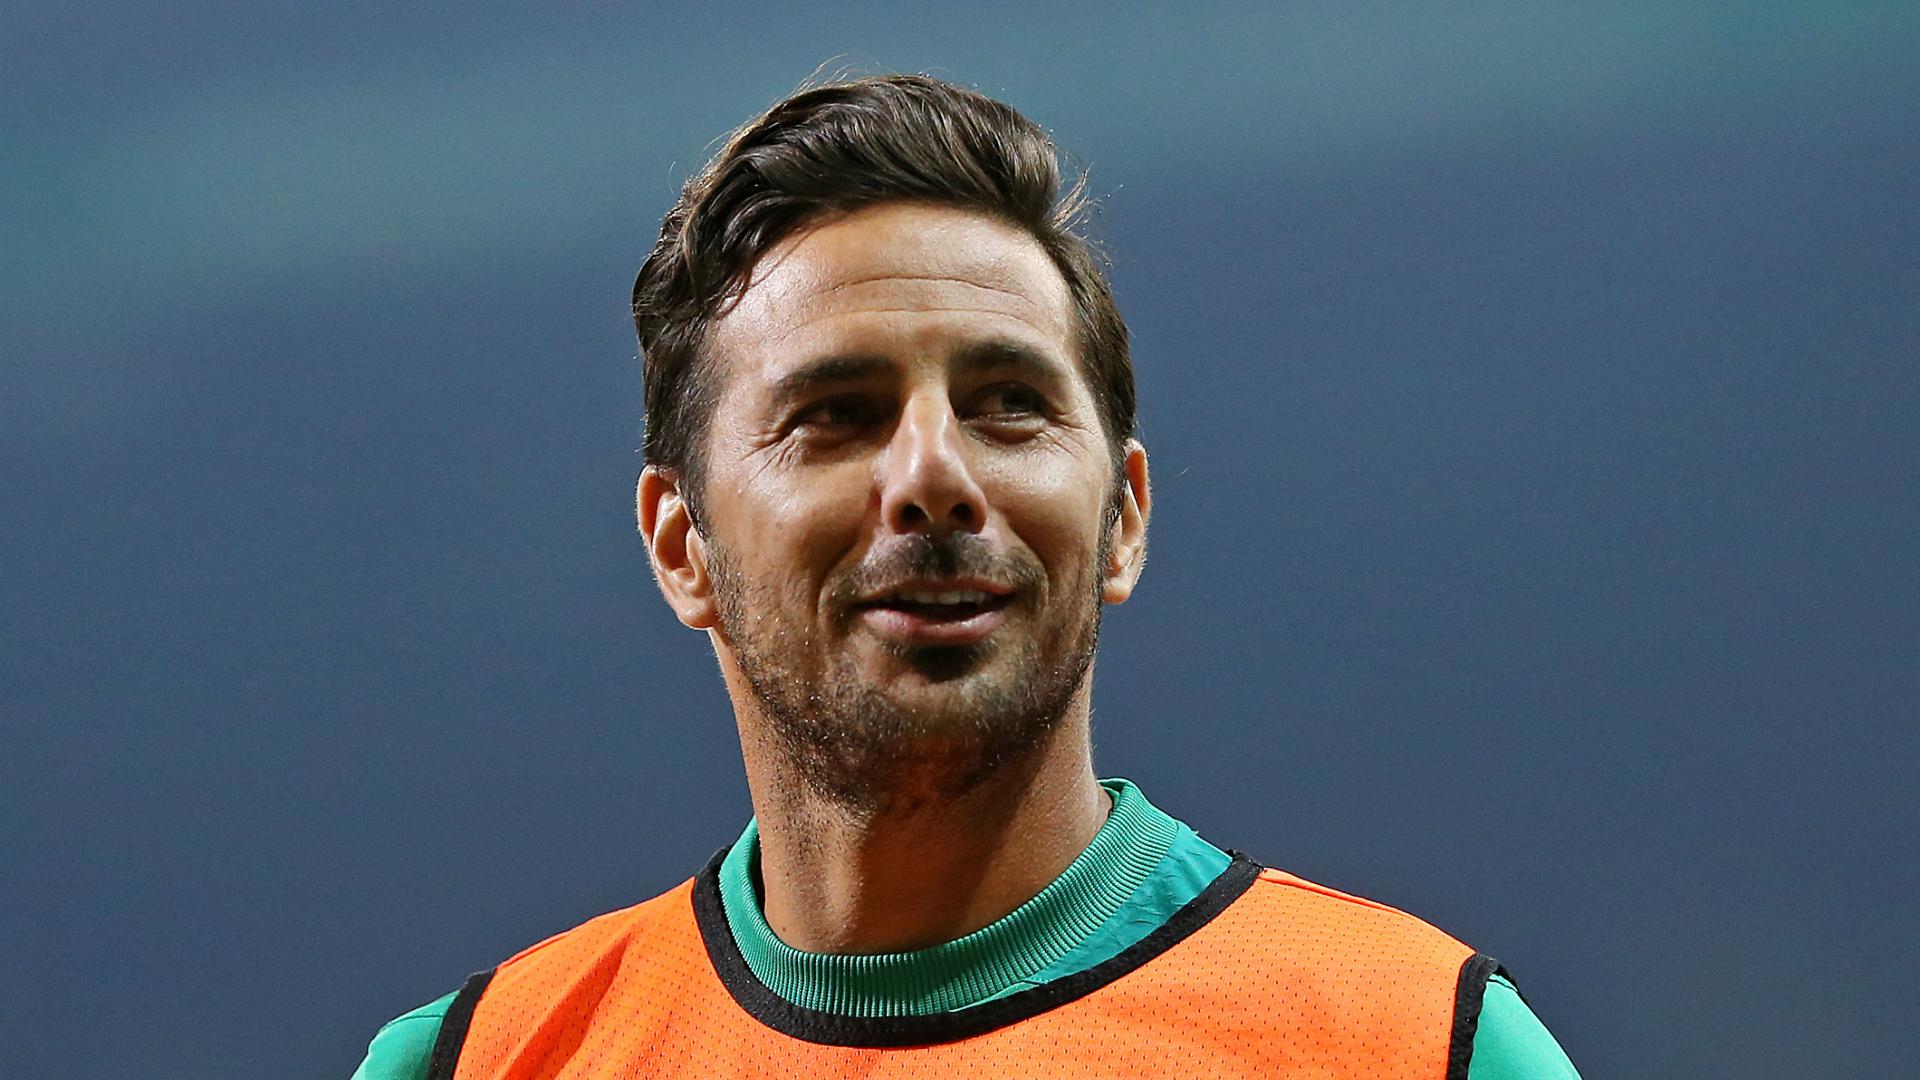 Werder veteran Pizarro confirms retirement plans